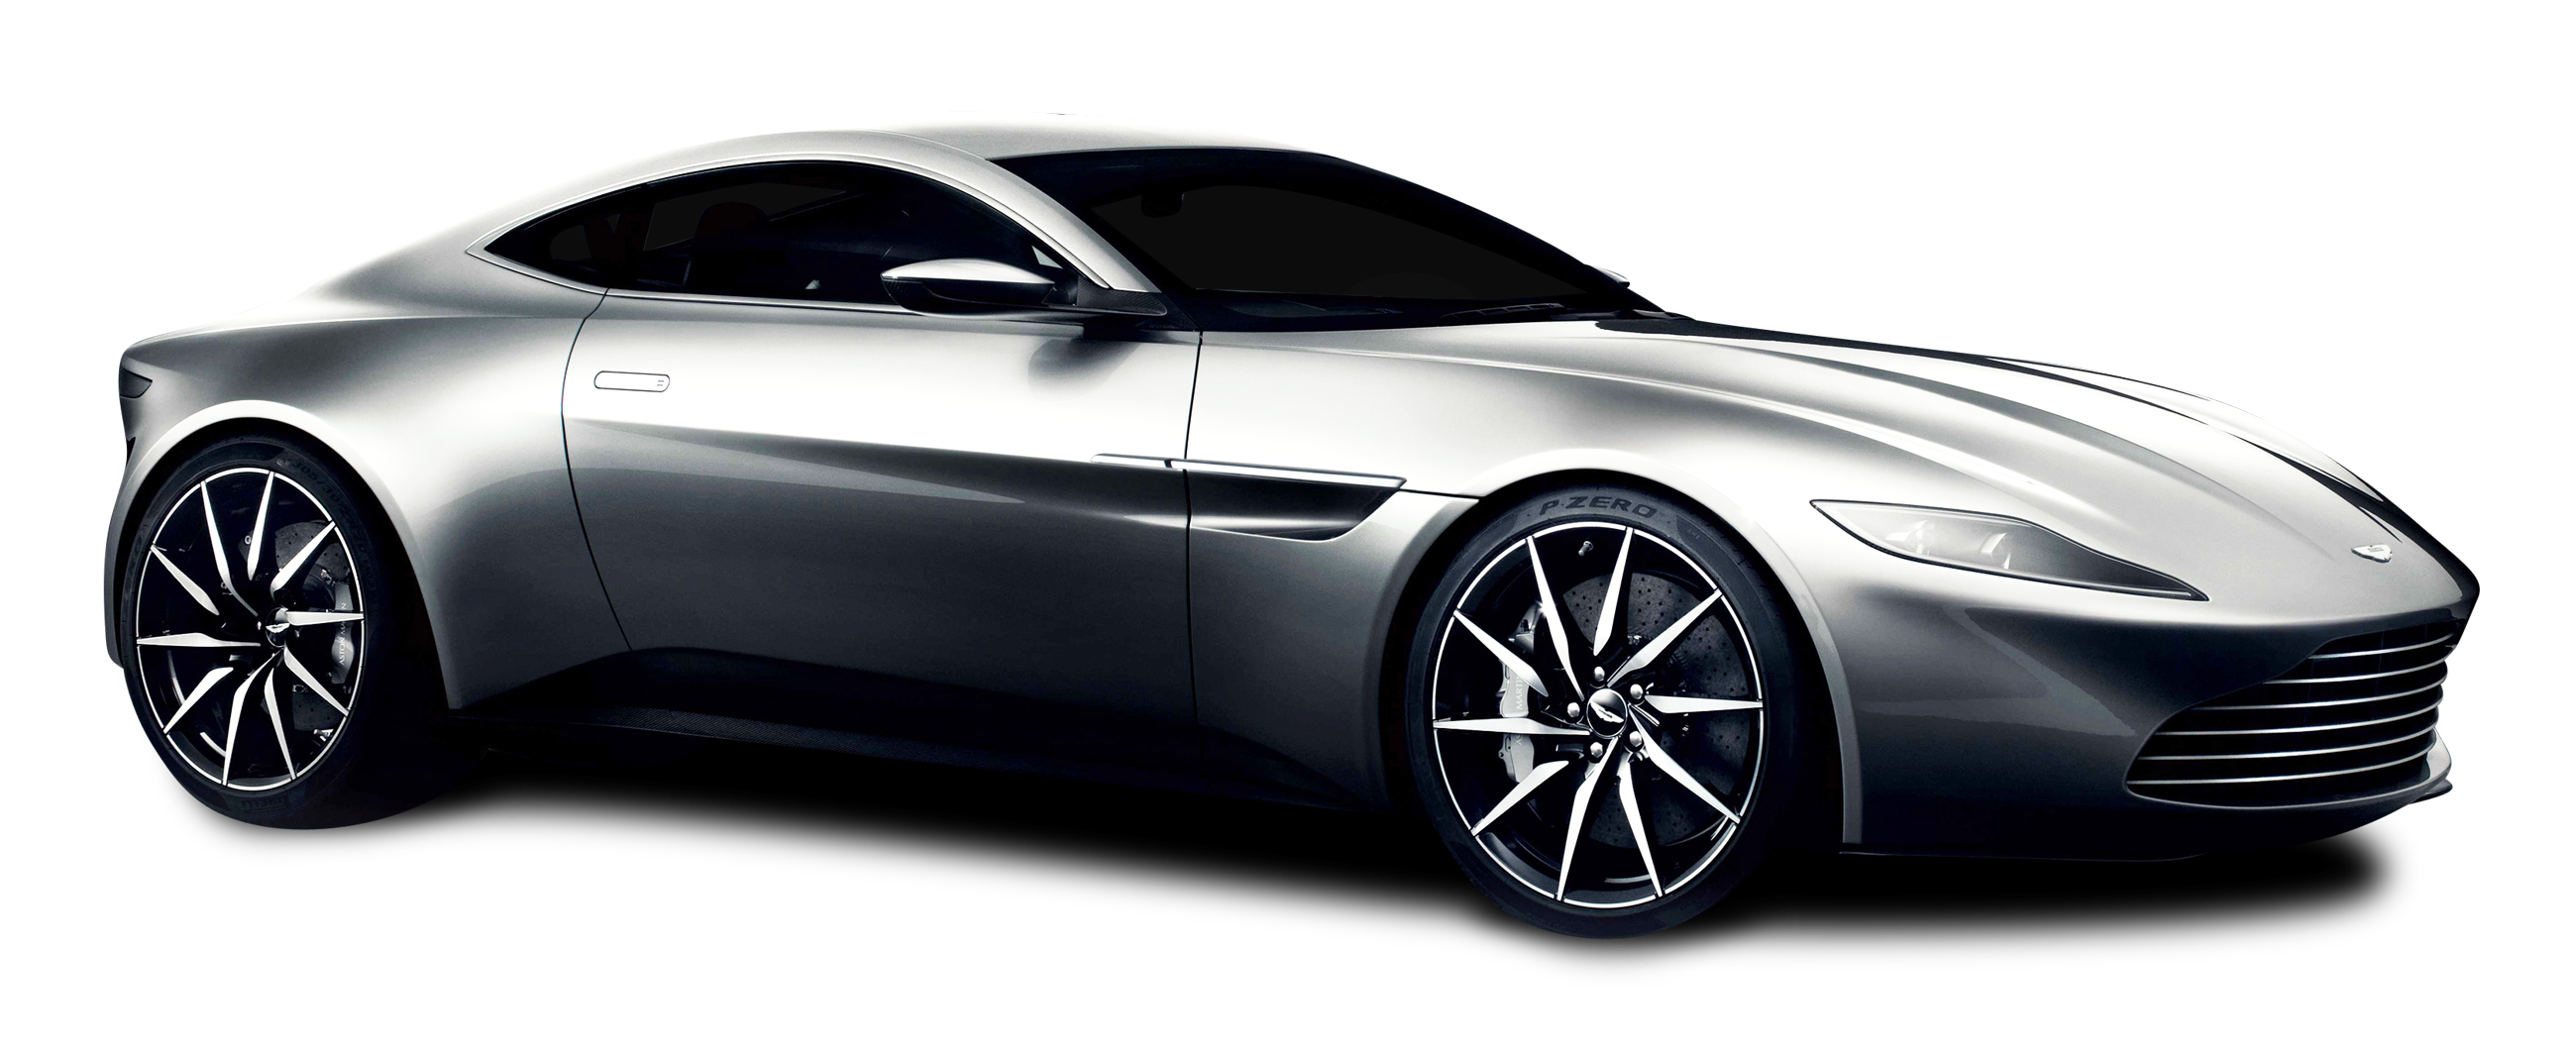 Aston Martin DB10 Silver Car PNG Image.